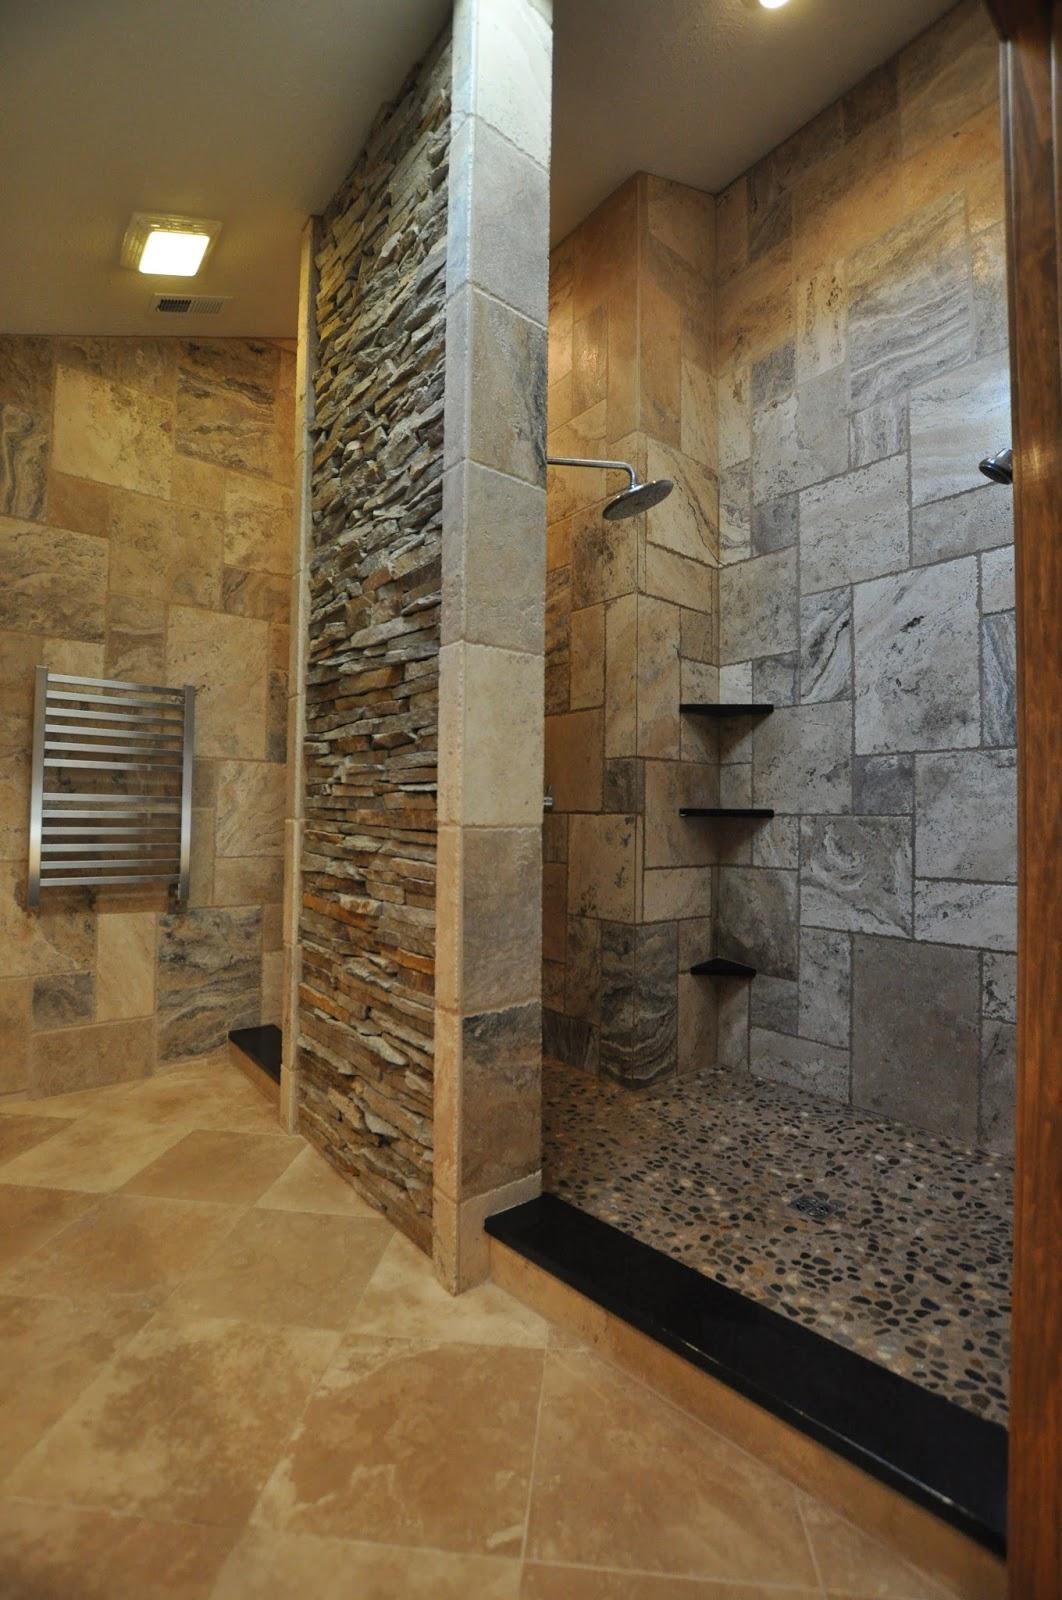 Natural Stone Tiles Bathroom Design IdeasInterior Stage Blog. Natural stone bathroom designs ideas